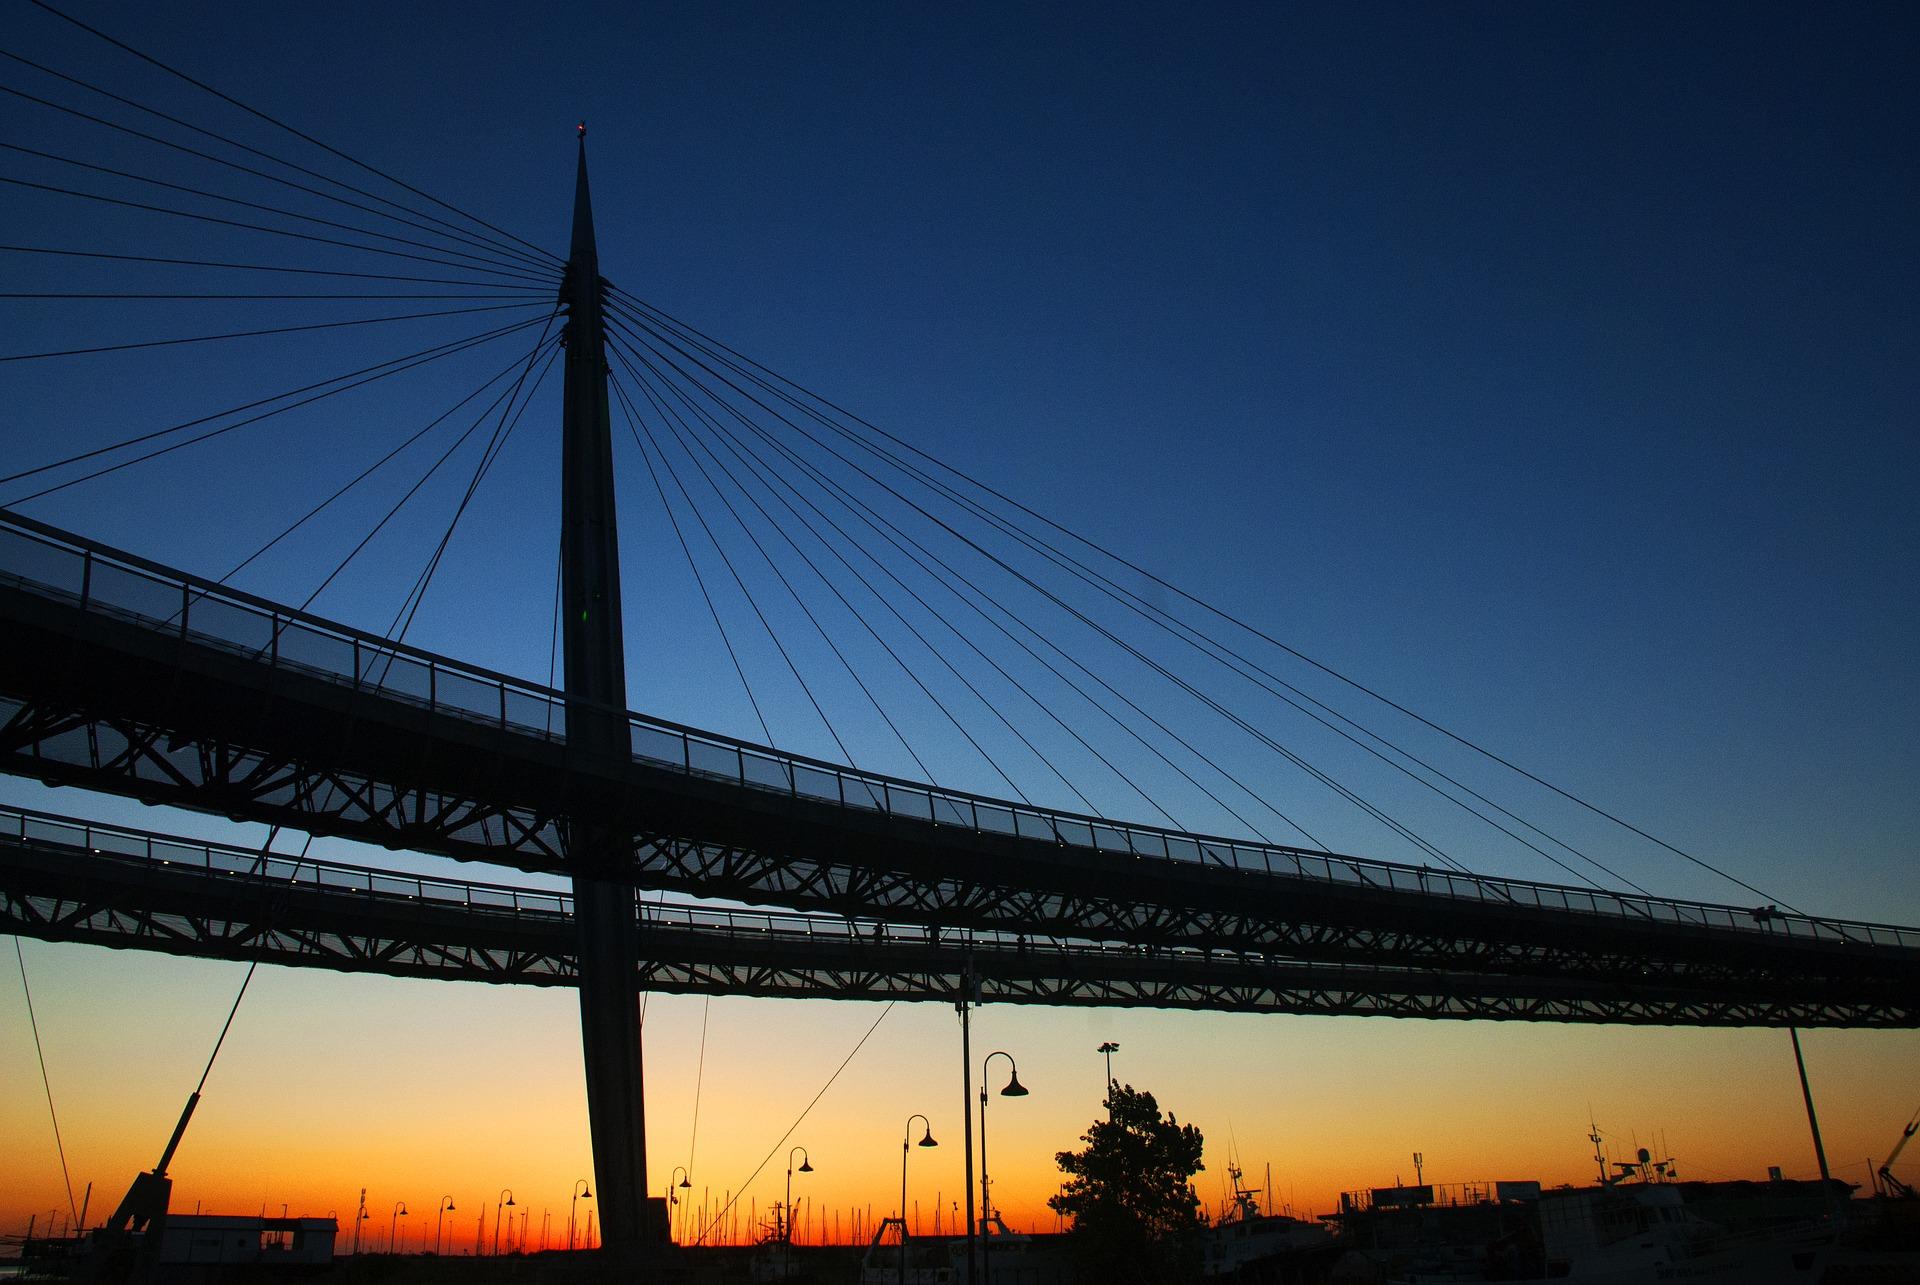 Ponte del Mare bridge in the sunset.